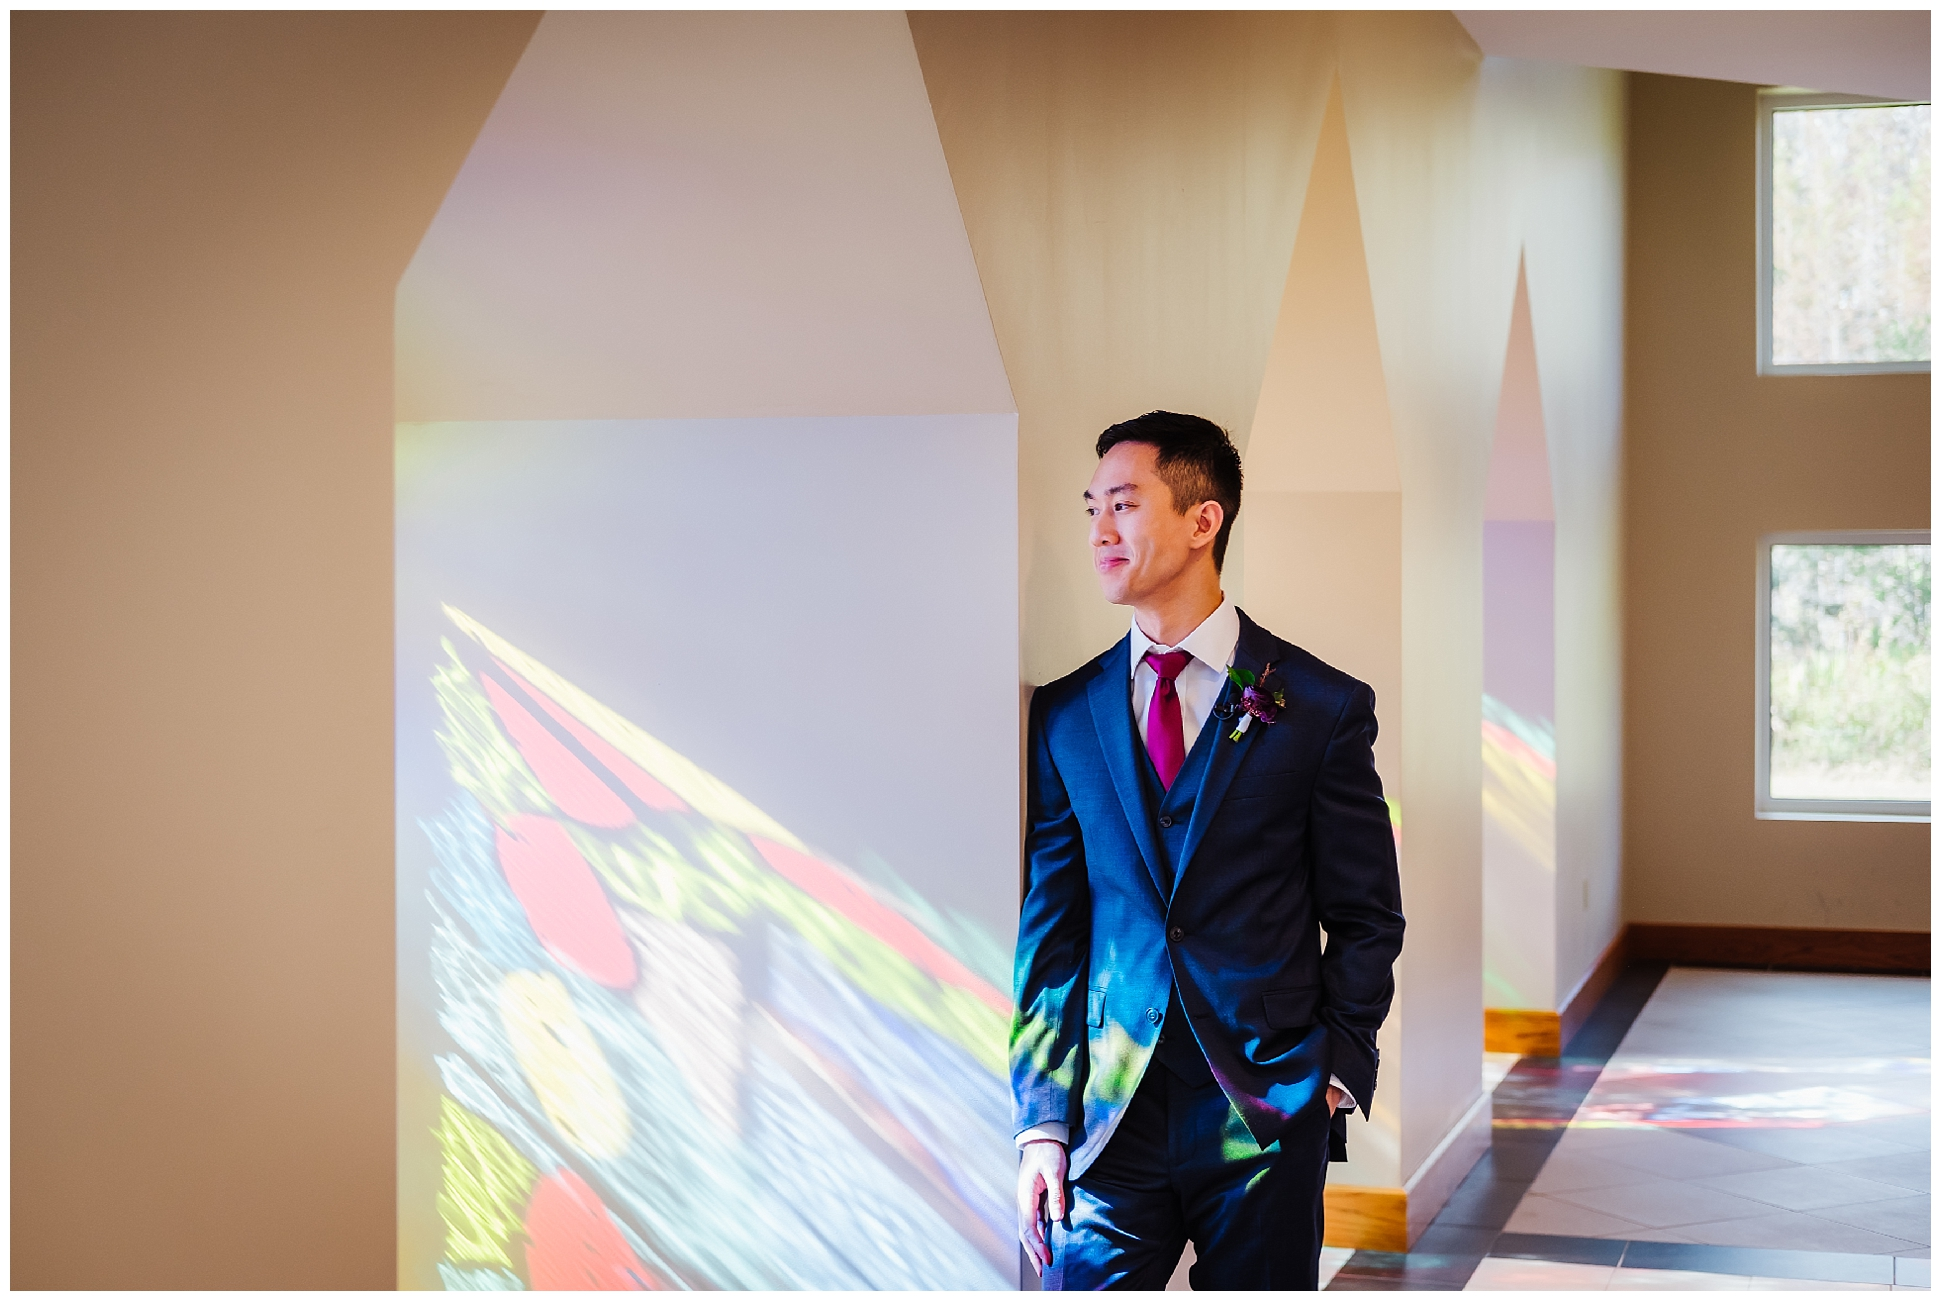 tampa-wedding-photographer-philipino-colorful-woods-ballroom-church-mass-confetti-fuscia_0024.jpg